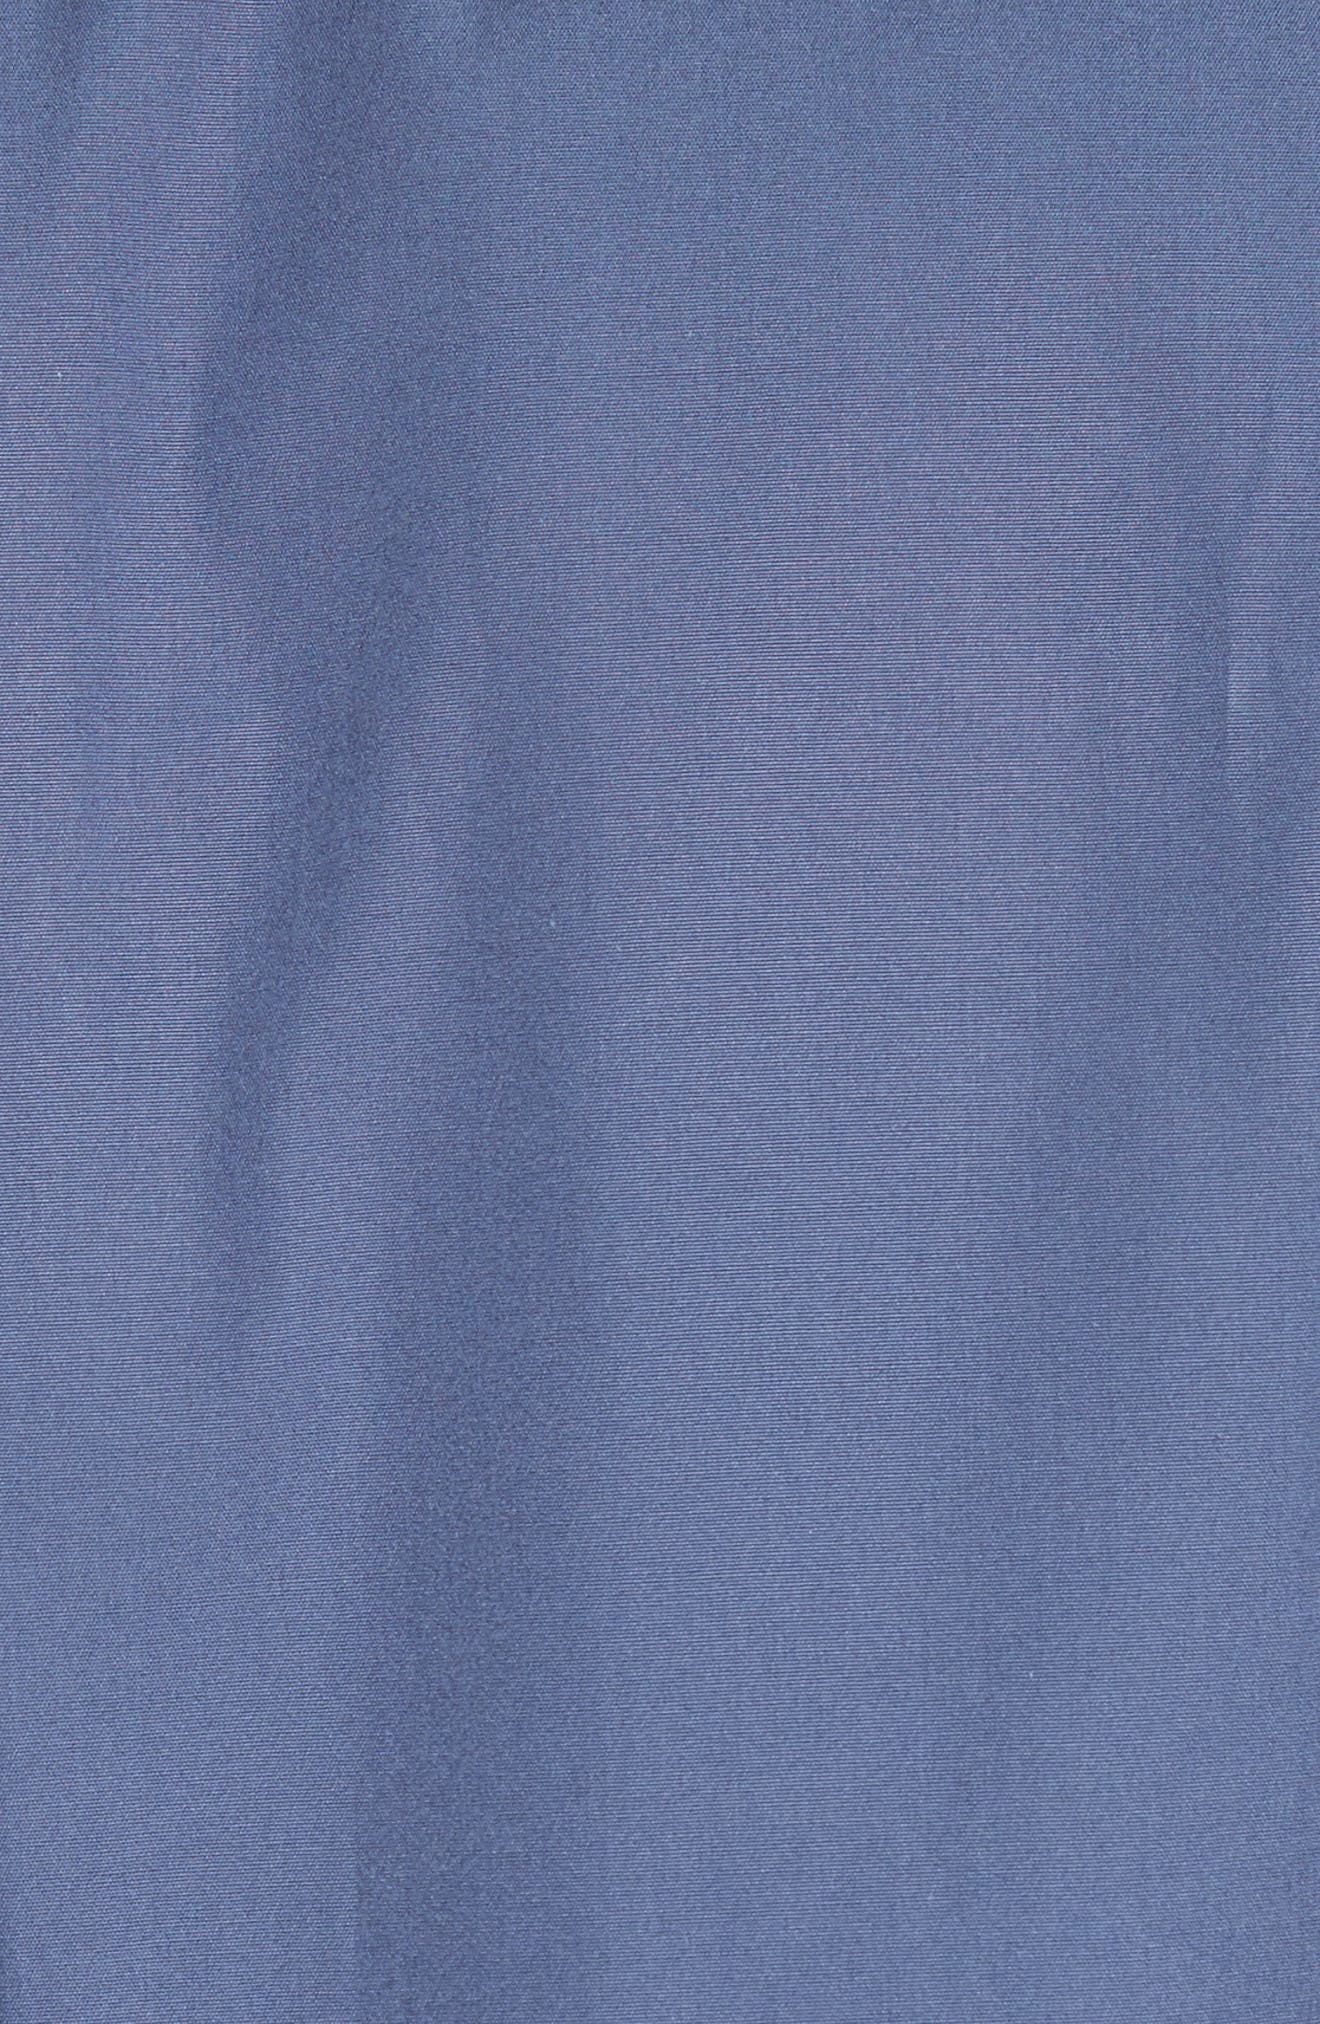 Kalila Top,                             Alternate thumbnail 5, color,                             French Blue / Sorbet